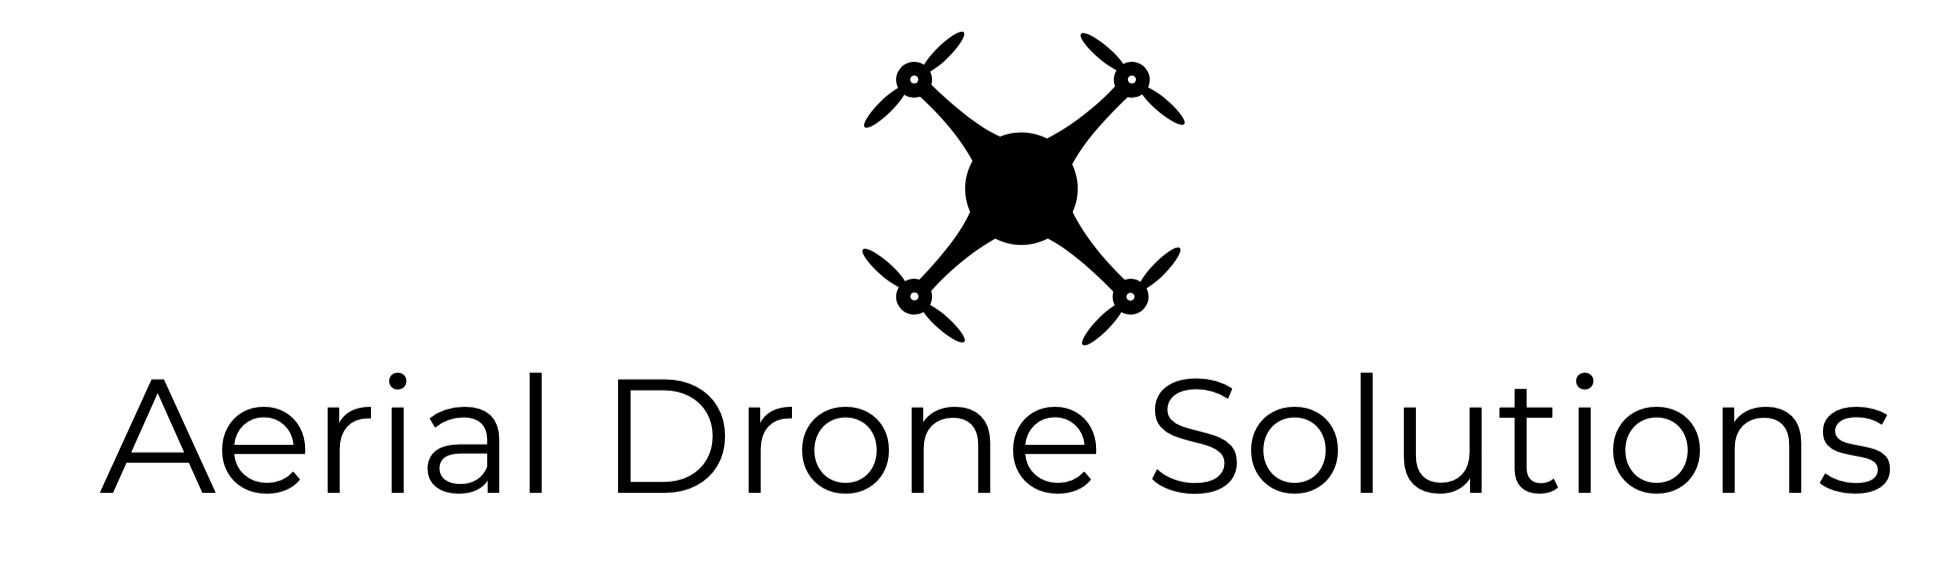 Aerial-drone-solutions-logo.jpg